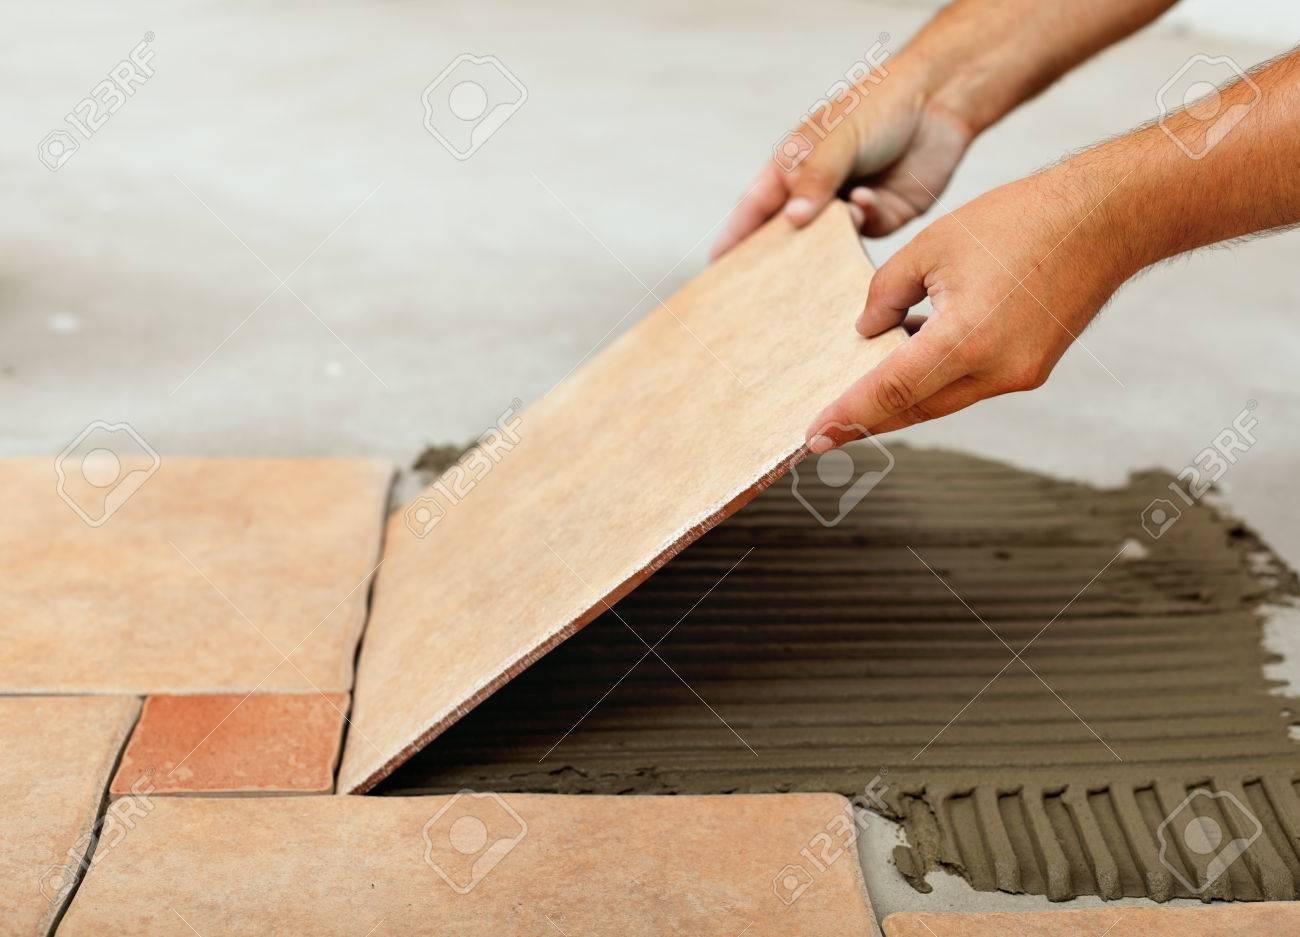 Installing ceramic floor tiles placing the tile into the adhesive installing ceramic floor tiles placing the tile into the adhesive material bedding closeup stock dailygadgetfo Images